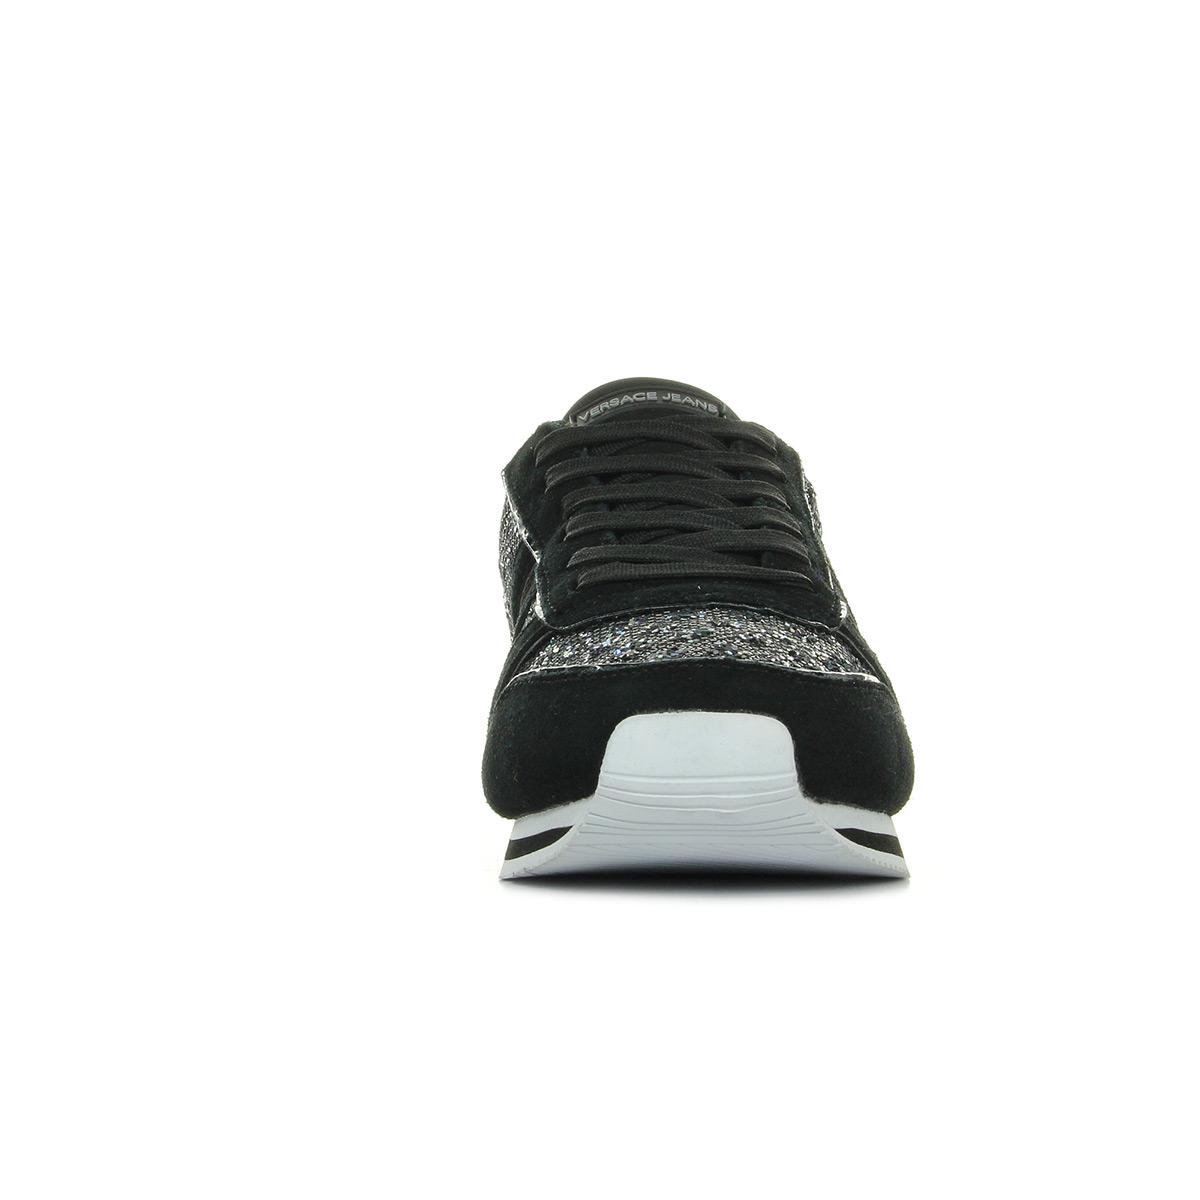 Dettagli su Chaussures Baskets Versace Jeans femme Linea Fondo Stella Dis1 Suede Glitter